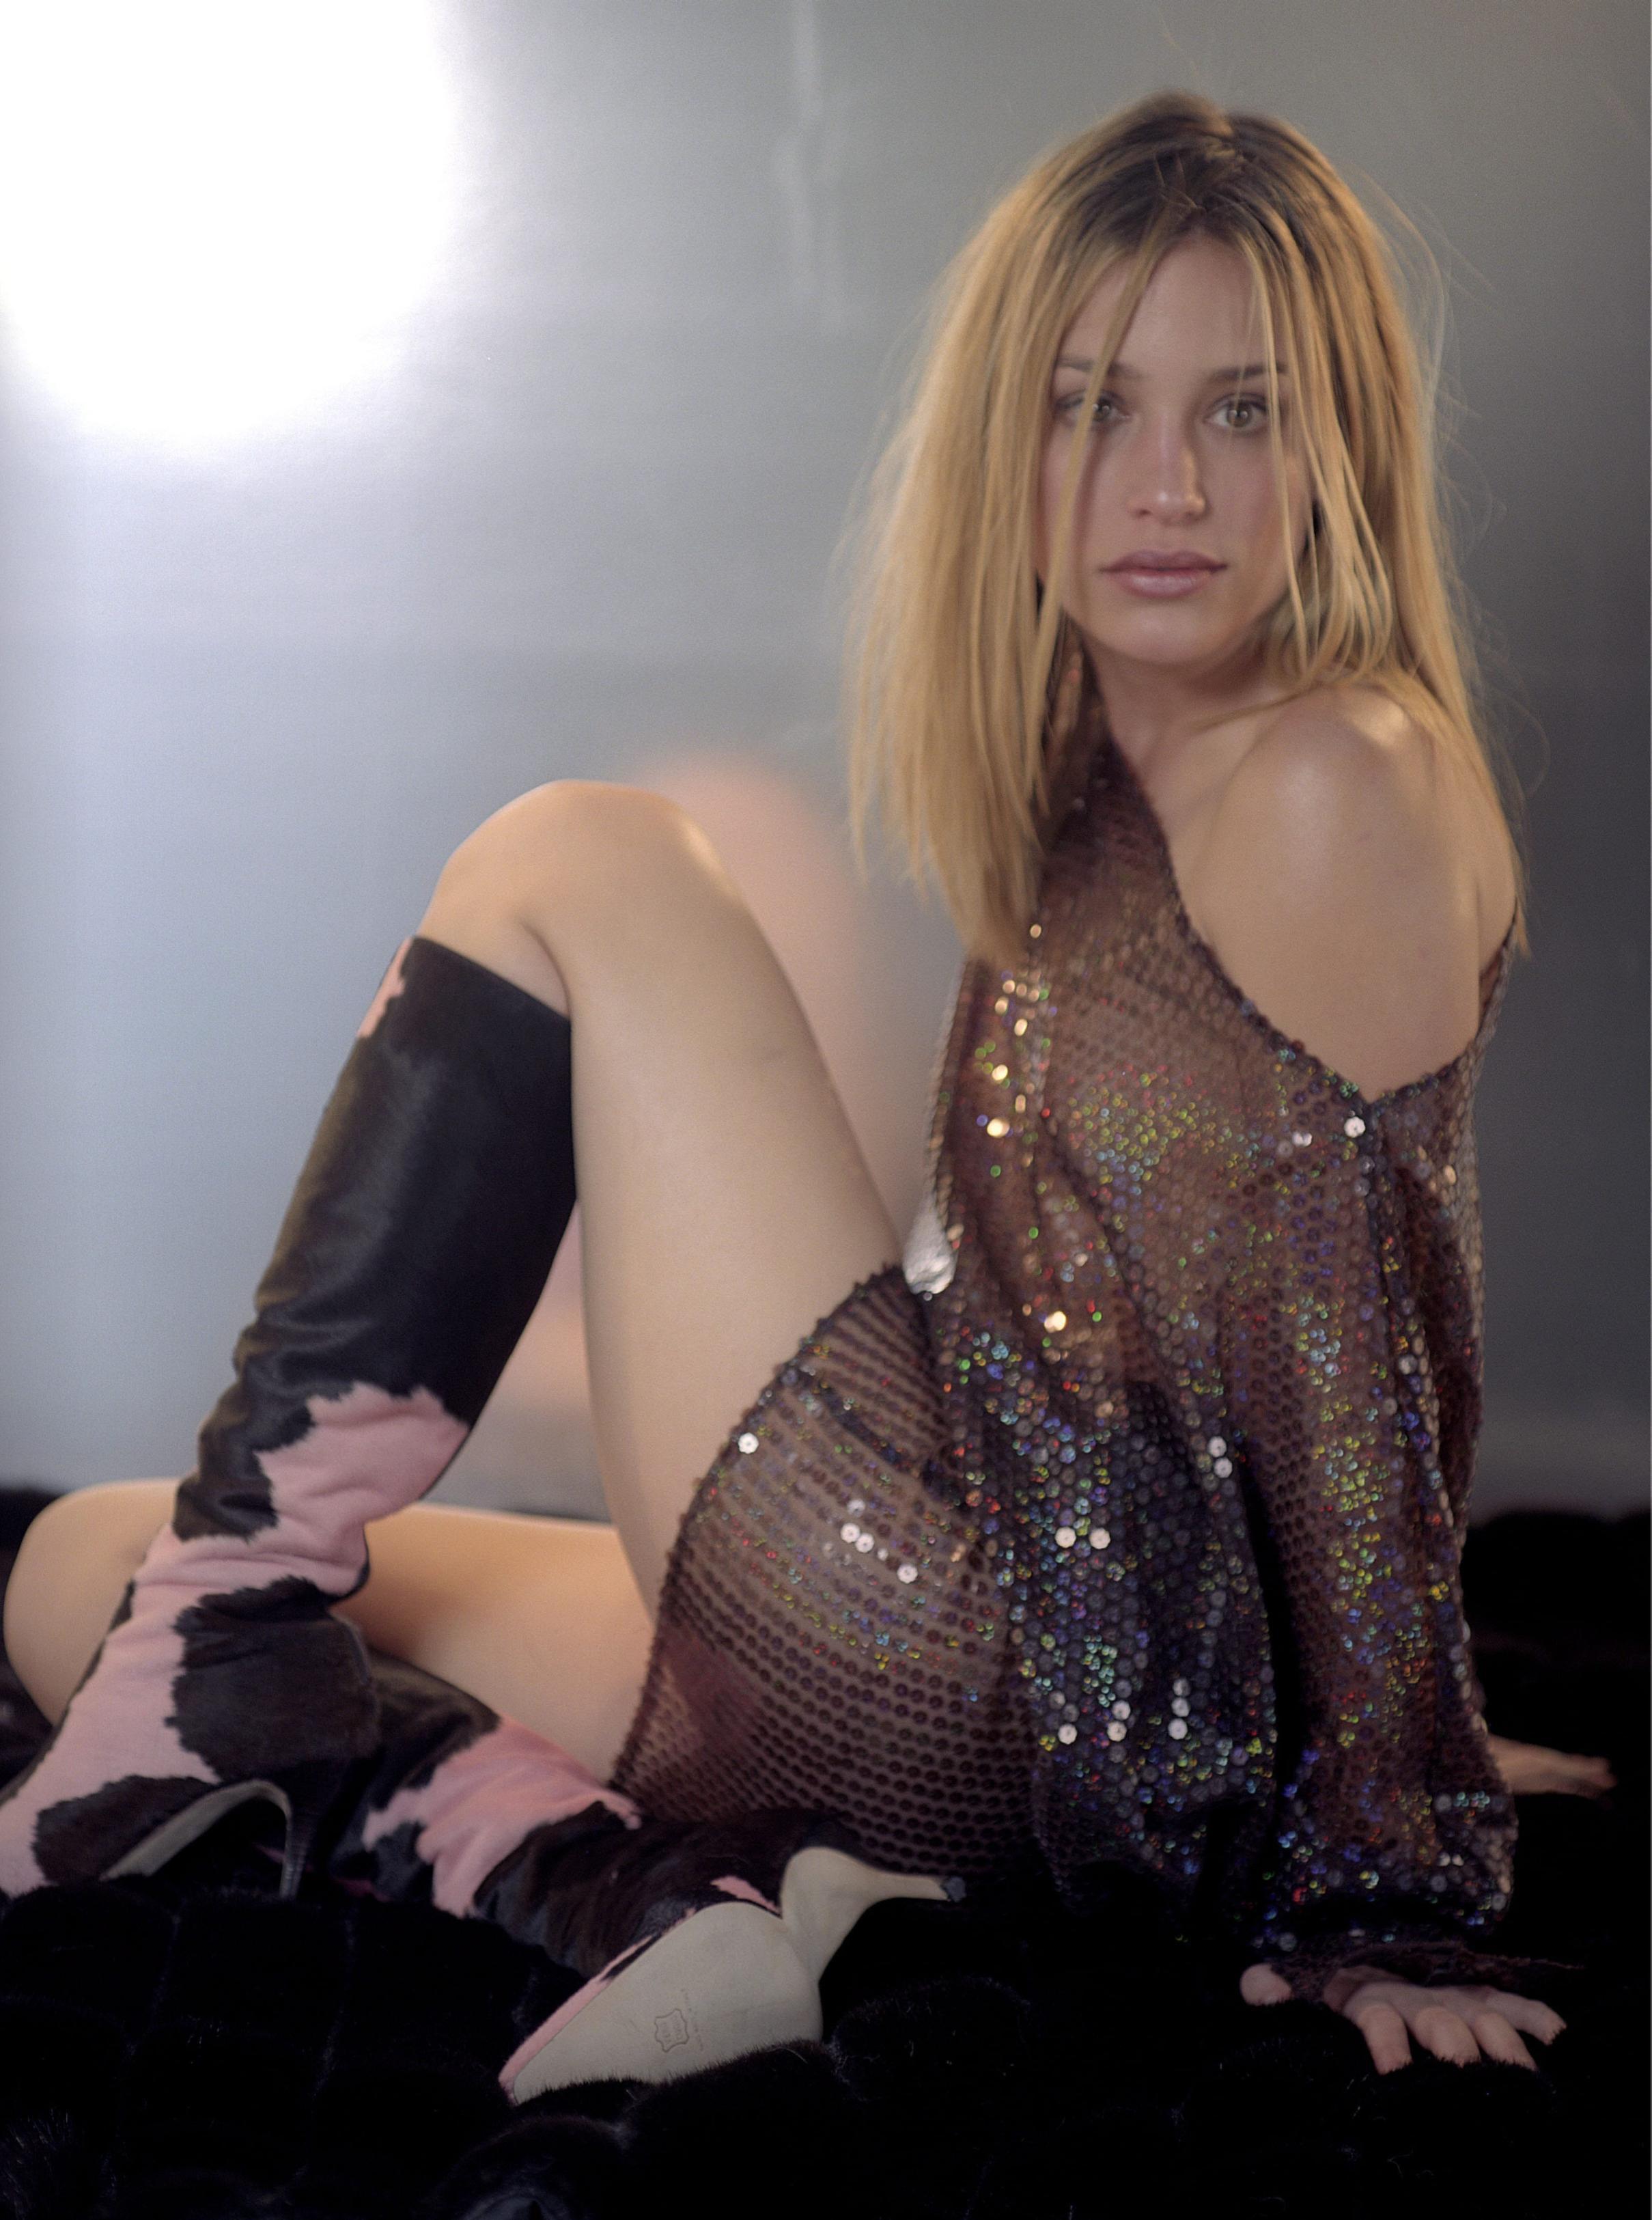 Piper perabo and jessica pare nude lost and delirious - 3 2